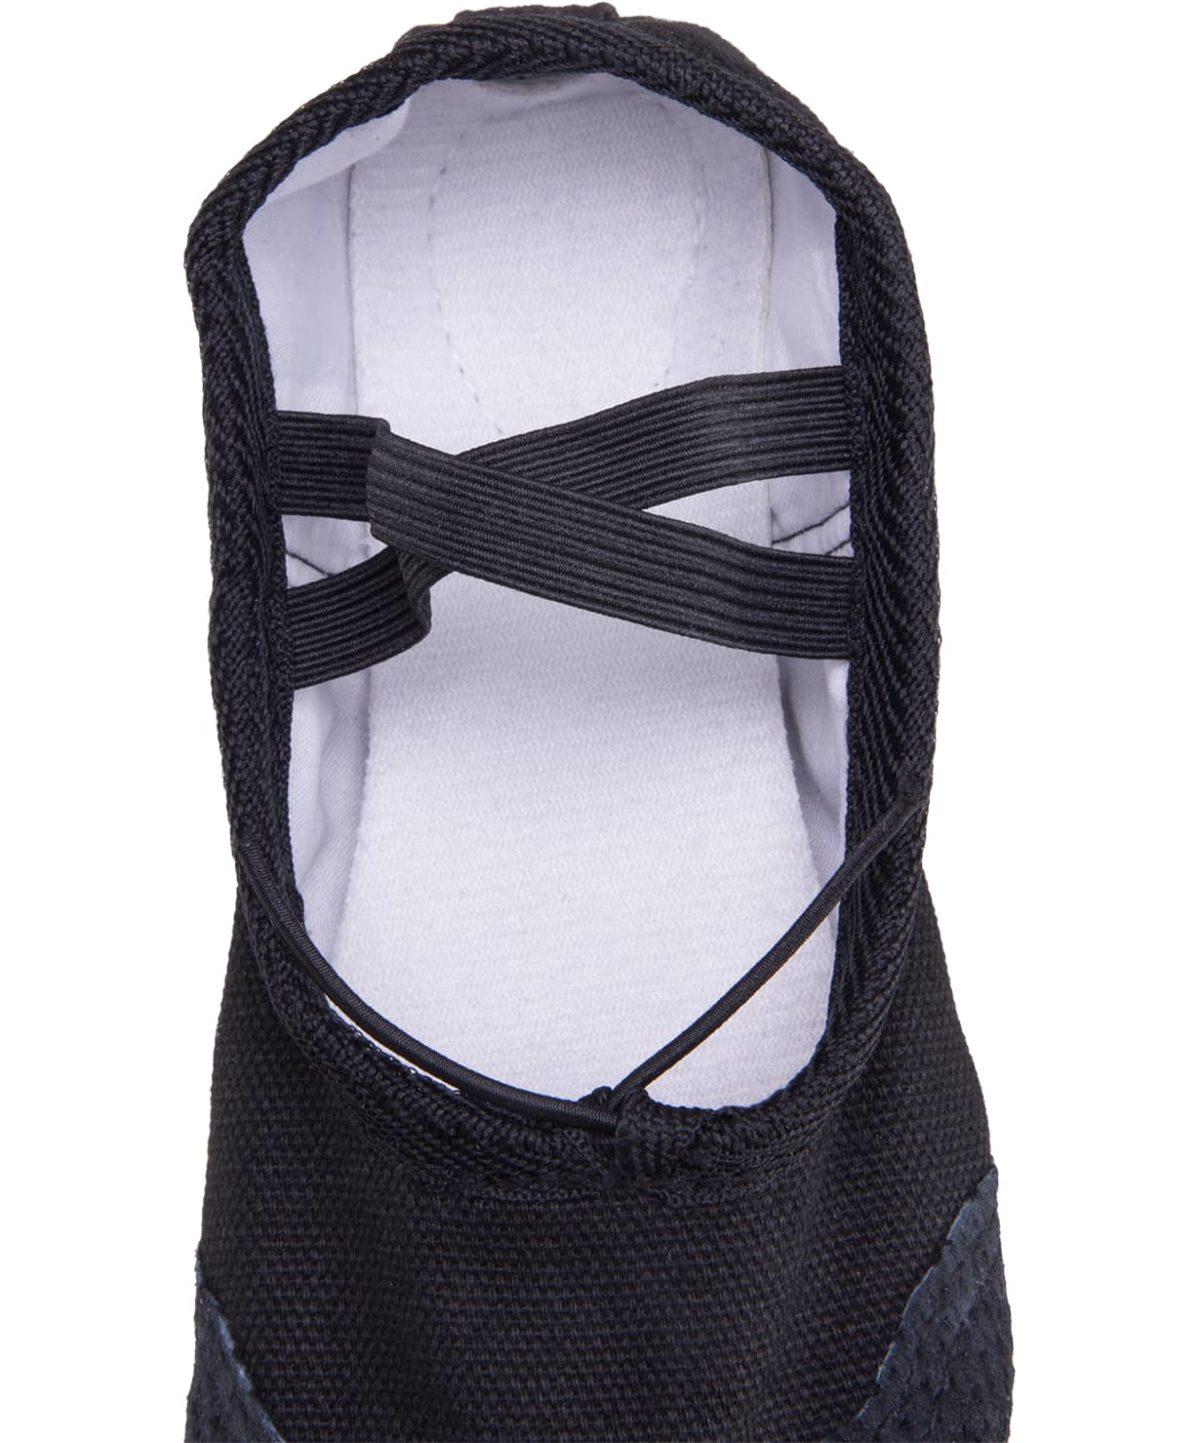 AMELY Балетки текстиль (24-26) SL-01: чёрный - 2